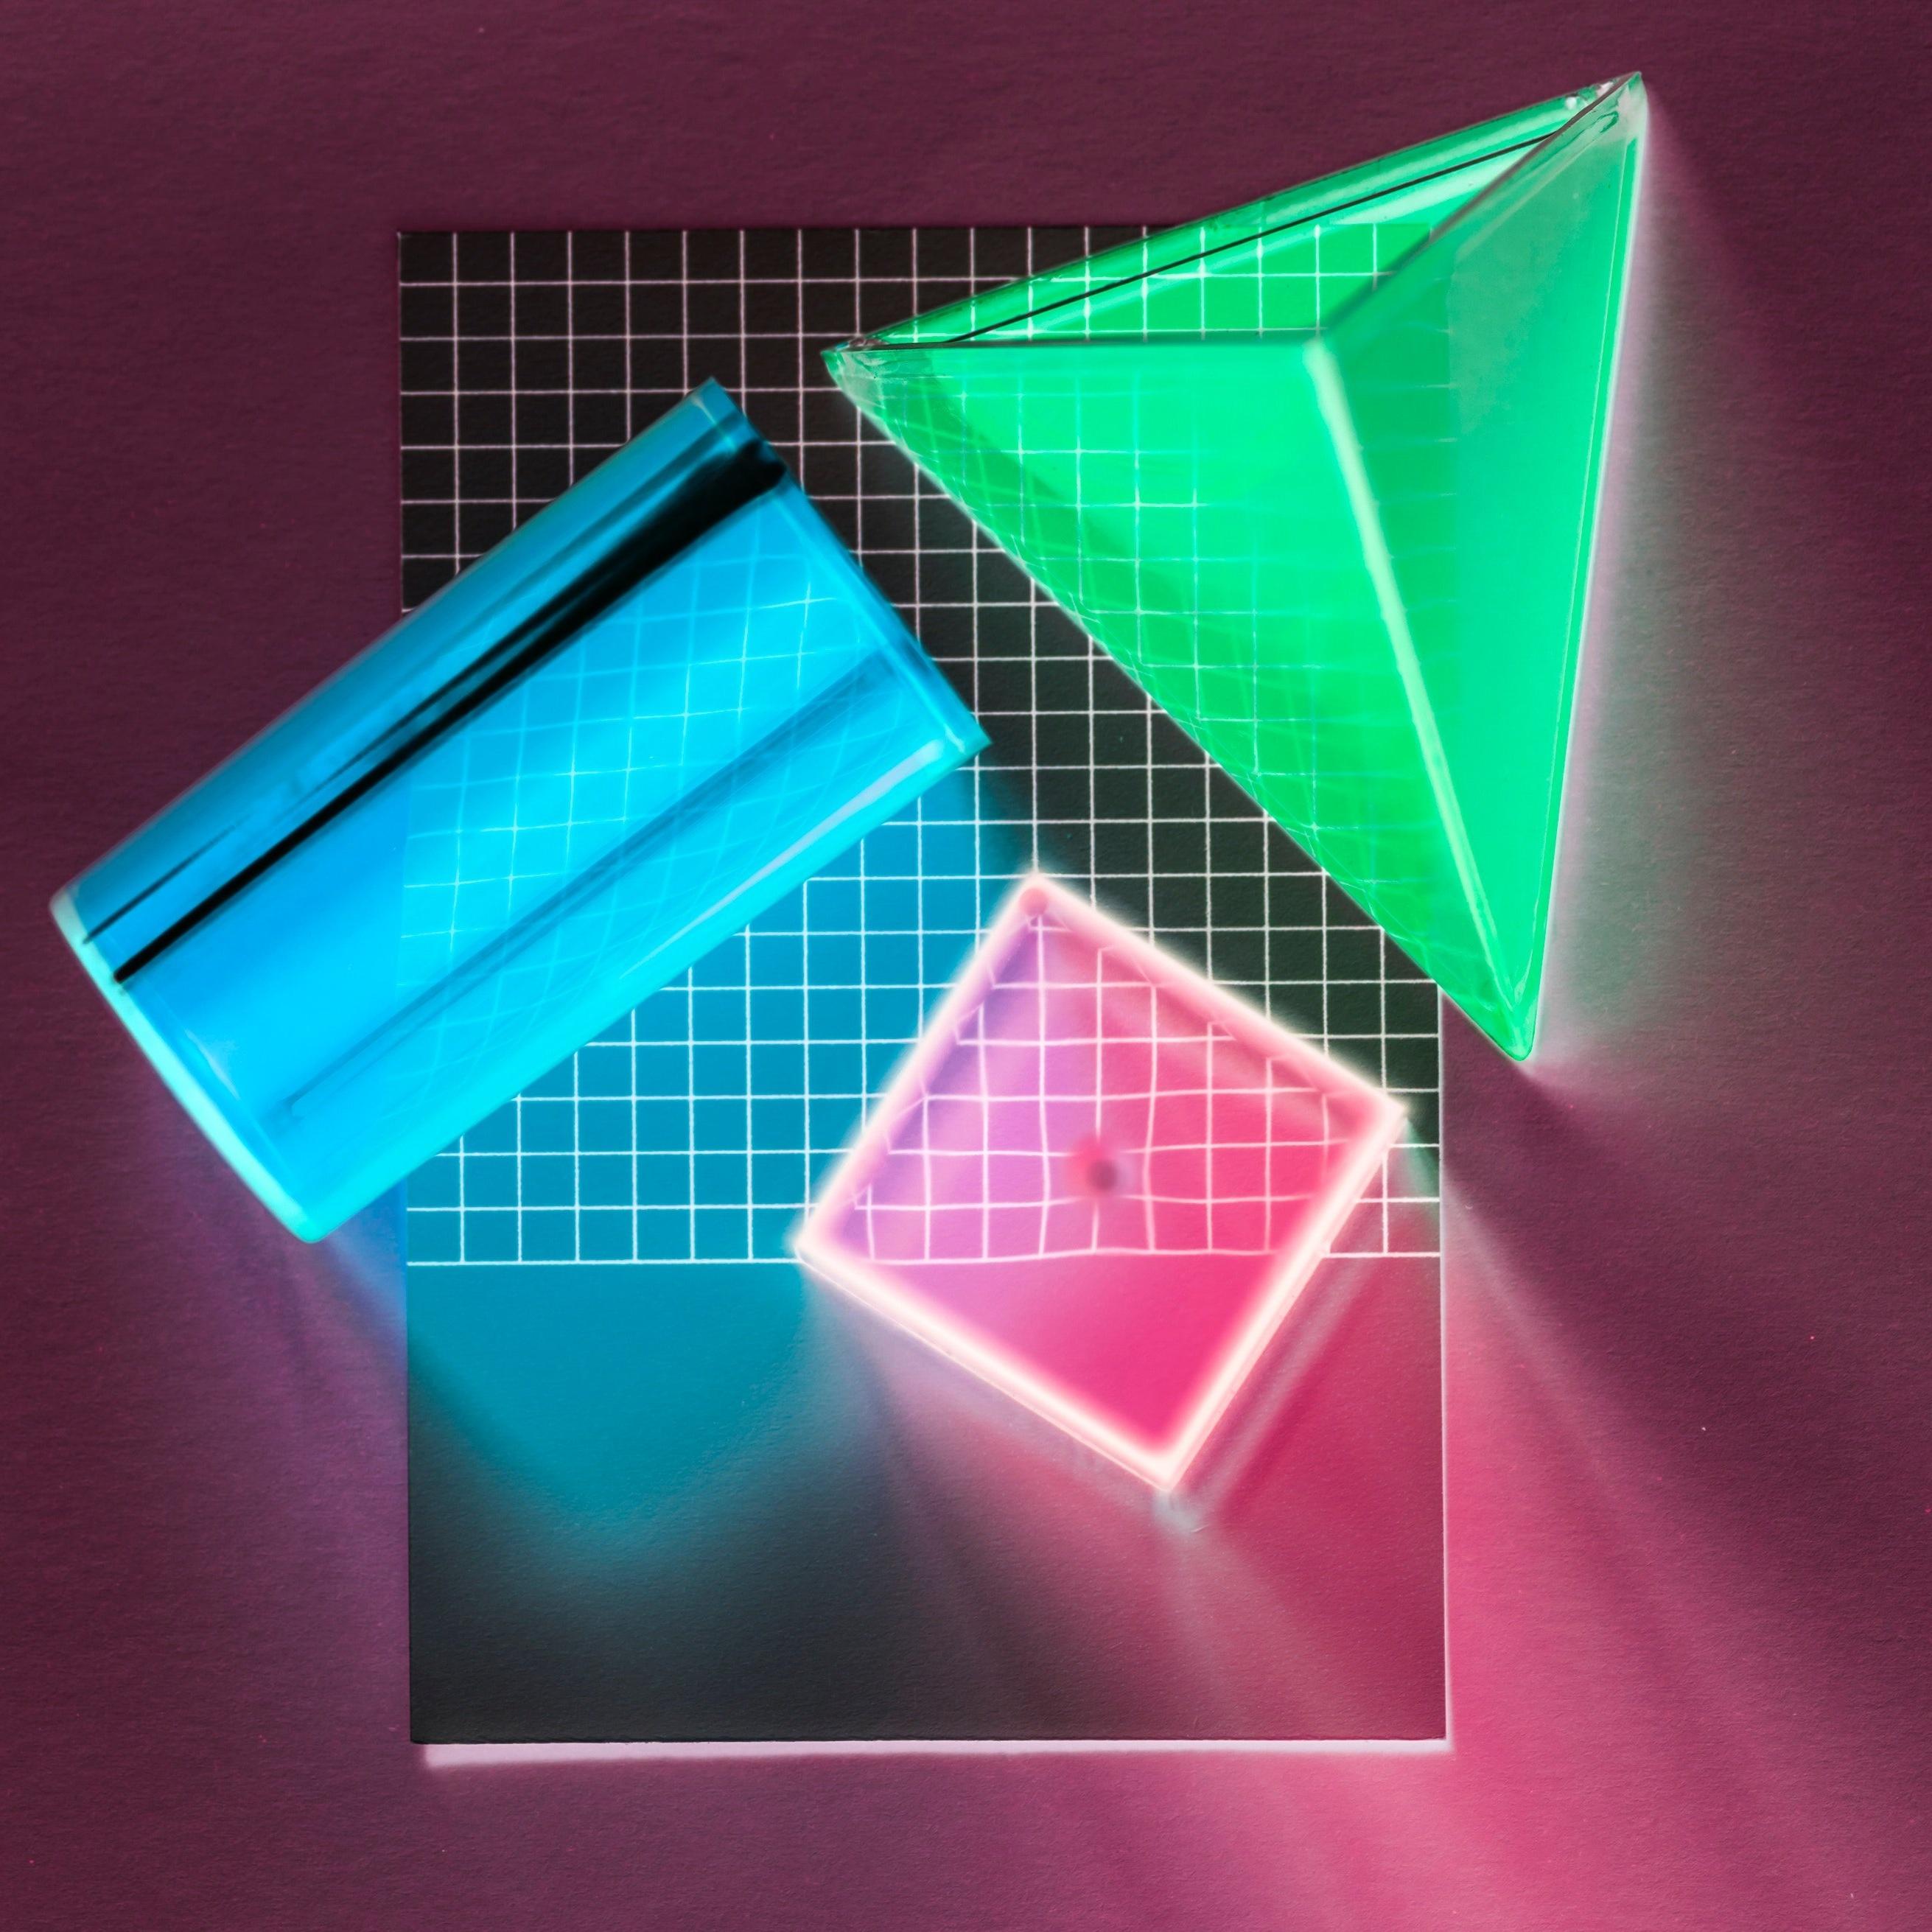 Geometry-041495-edited